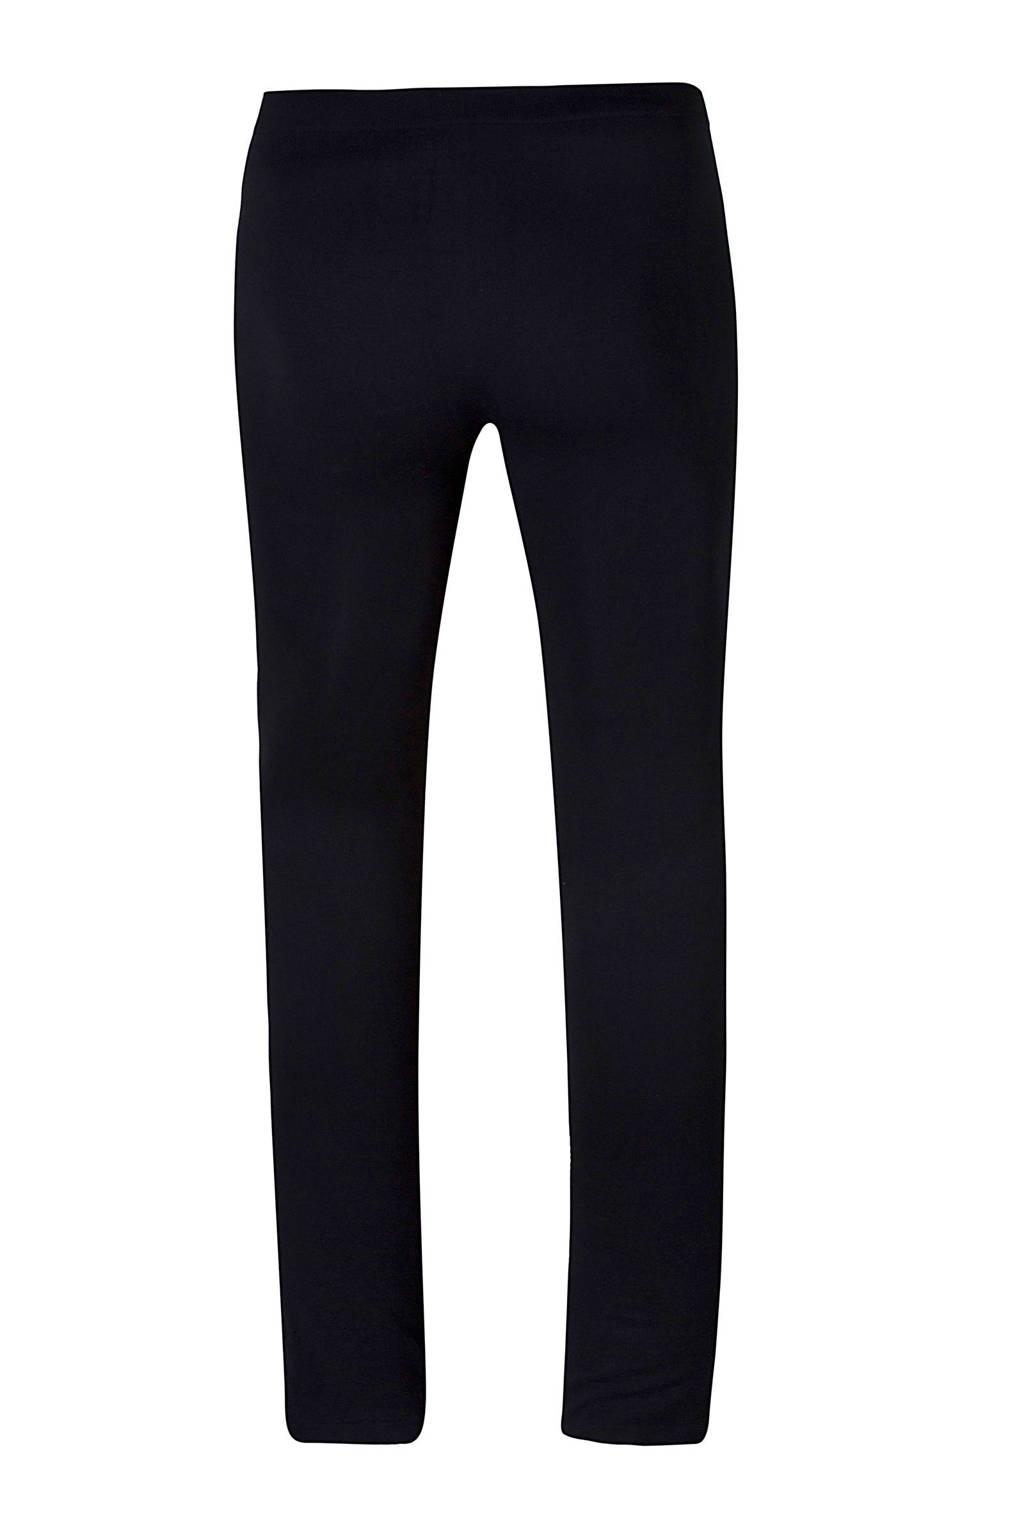 Zhenzi legging zwart, Zwart